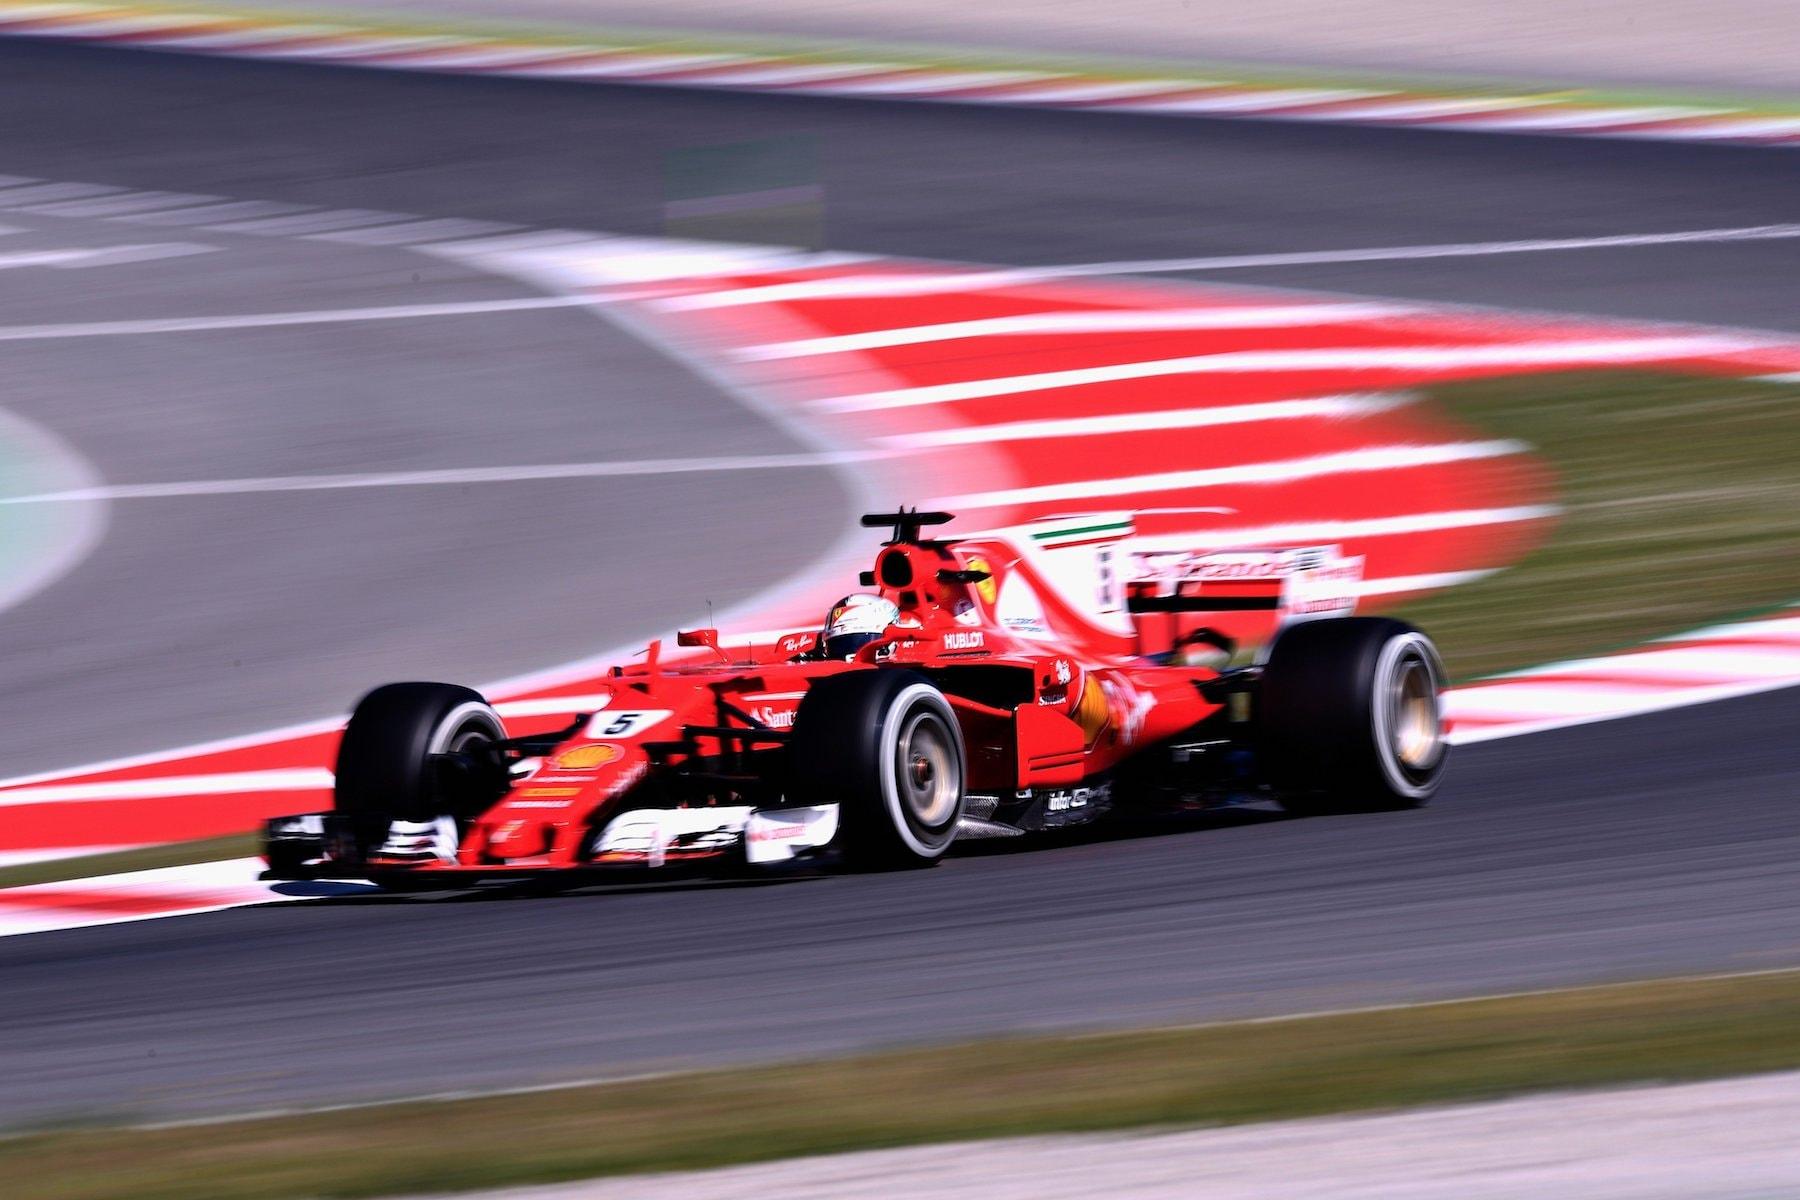 2017 Sebastian Vettel | Ferrari SF70H | 2017 Spanish GP FP1 2 copy.jpg